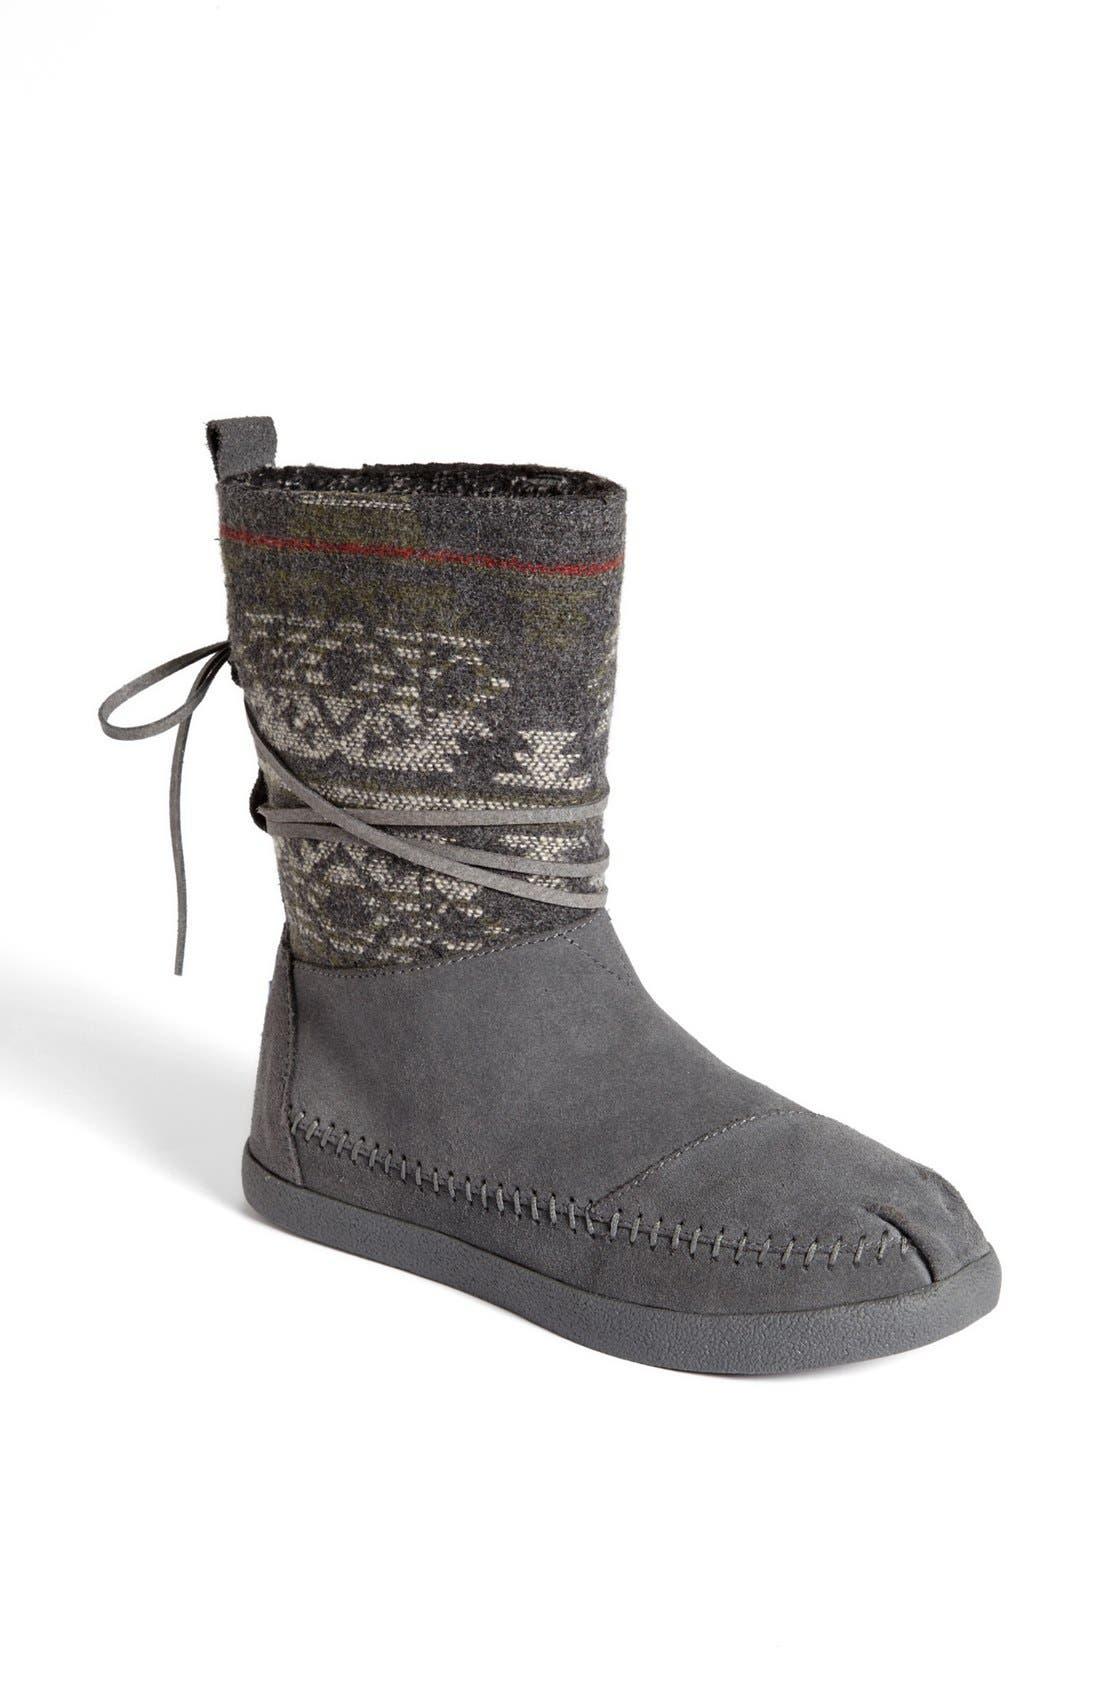 Alternate Image 1 Selected - TOMS 'Nepal - Jacquard' Boot (Women)